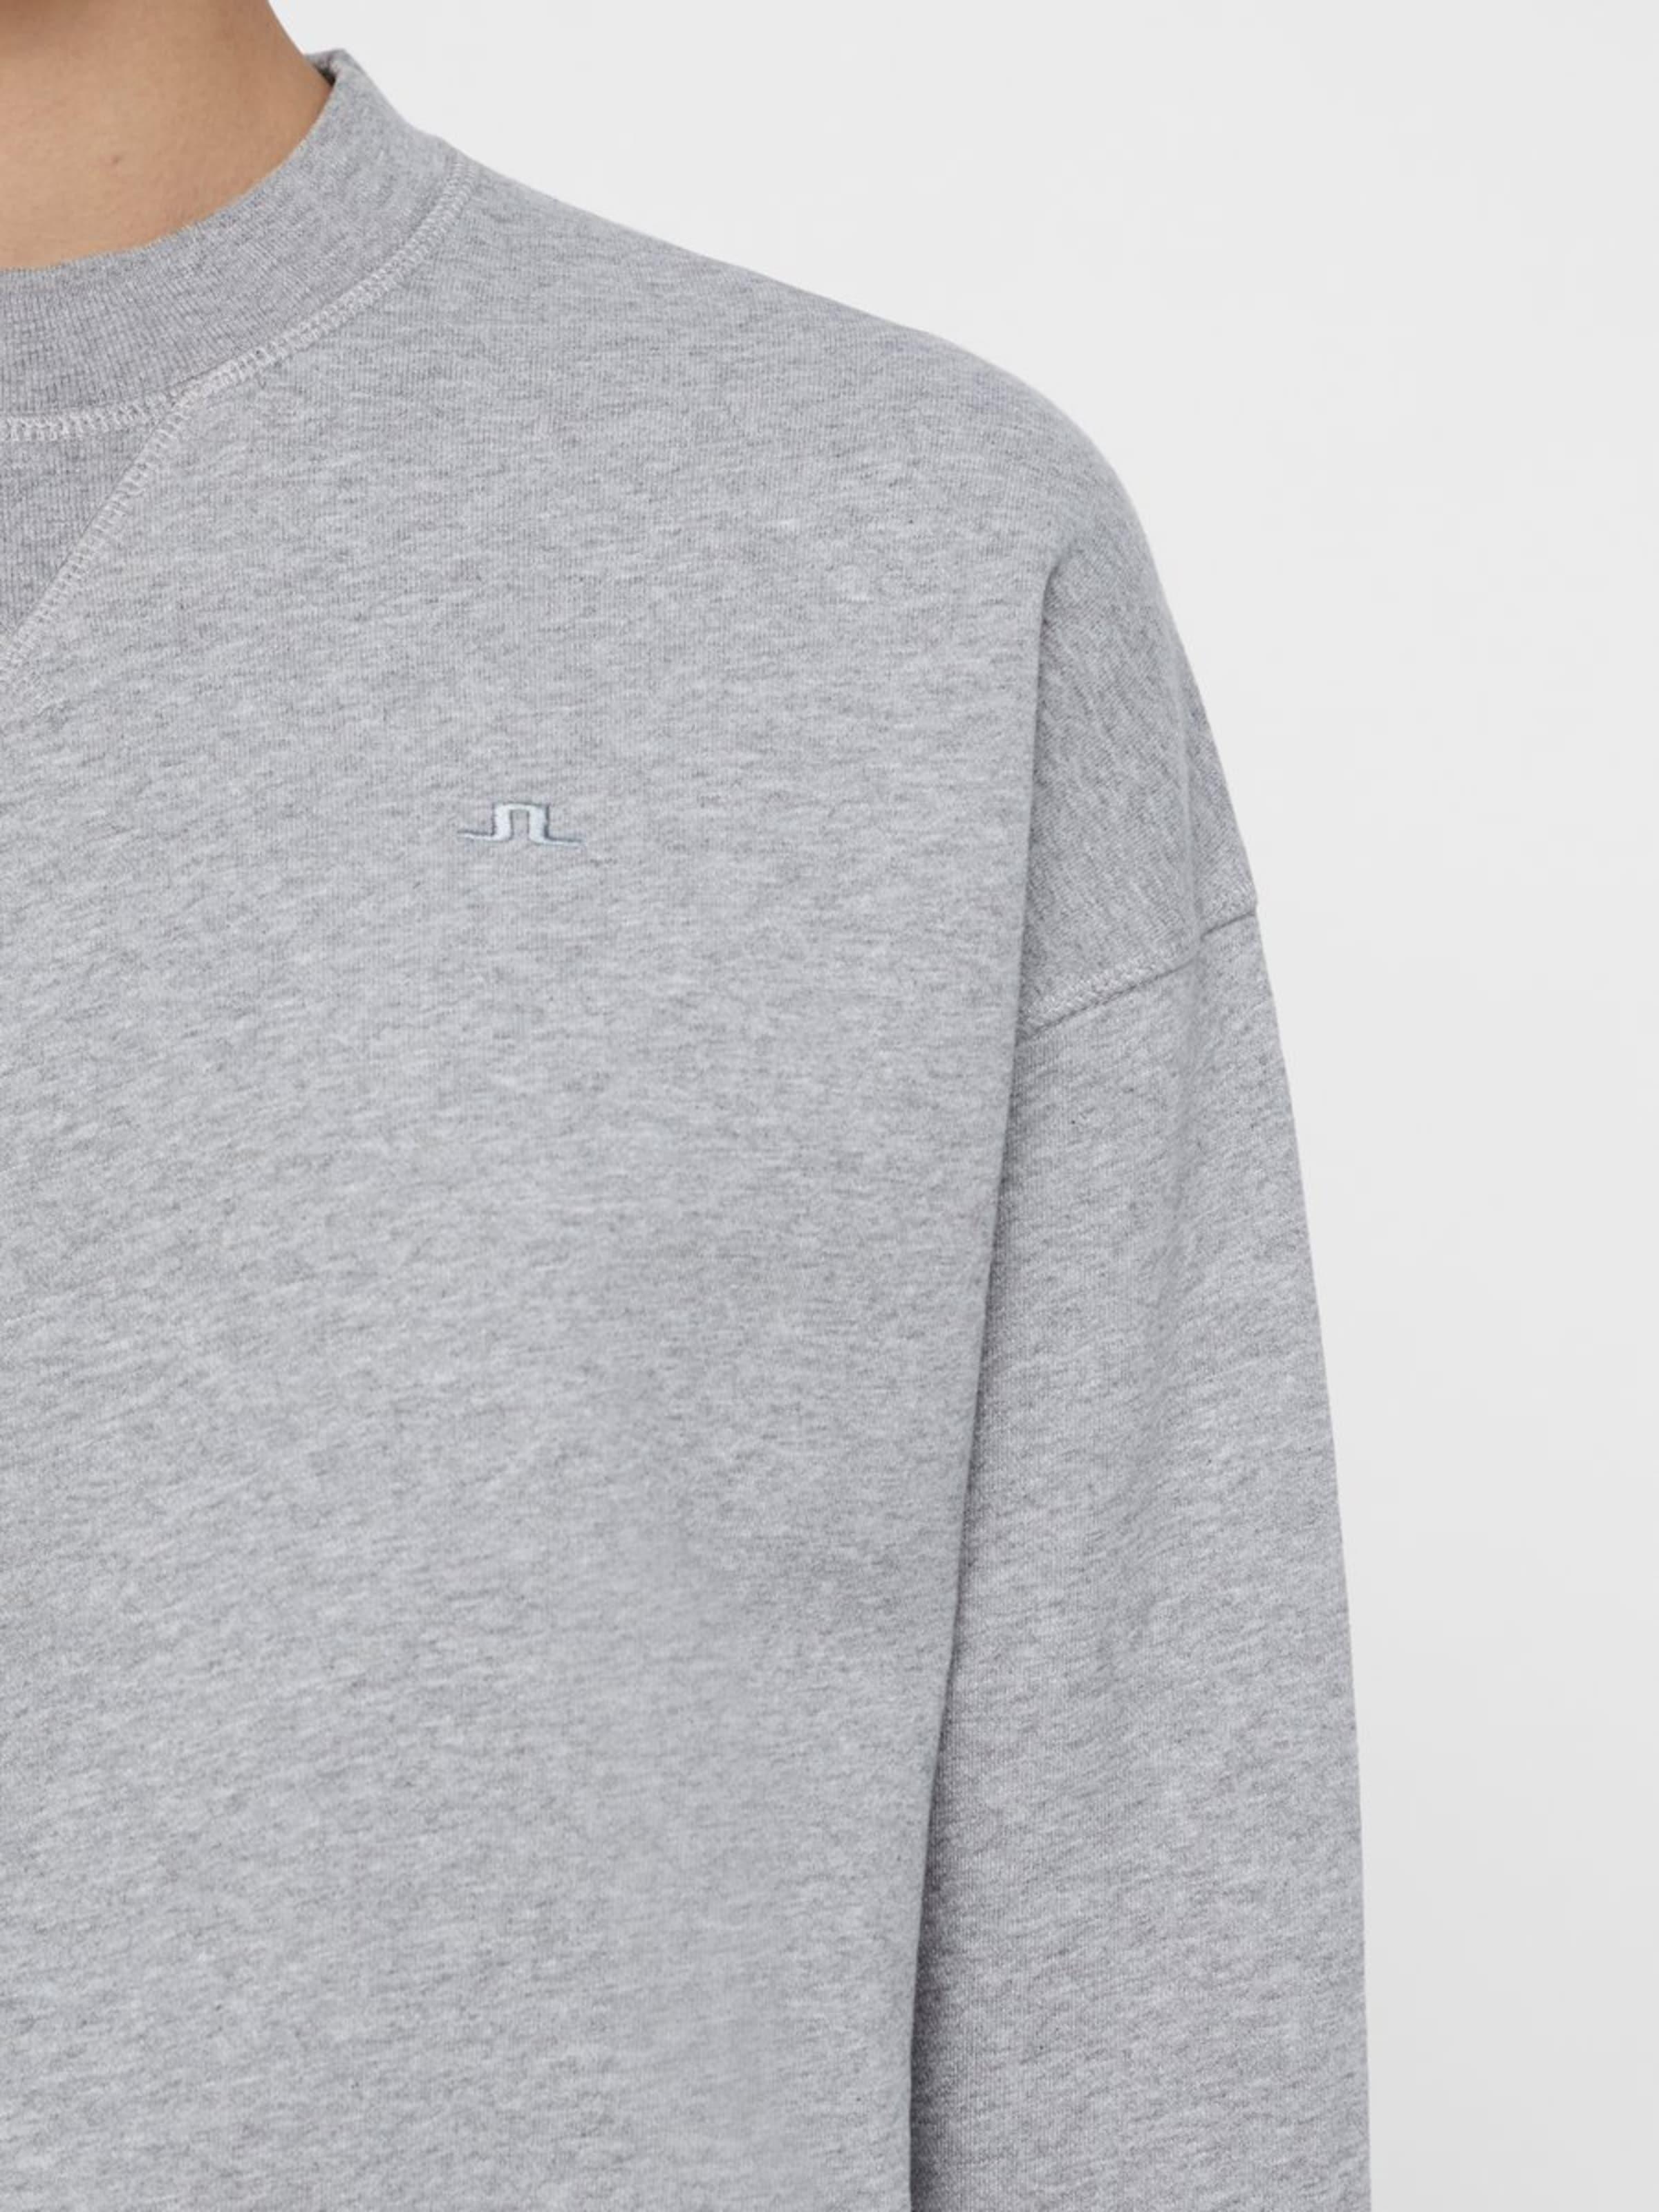 shirt J 'thea' lindeberg En Sweat Noir rtCBQdhxso